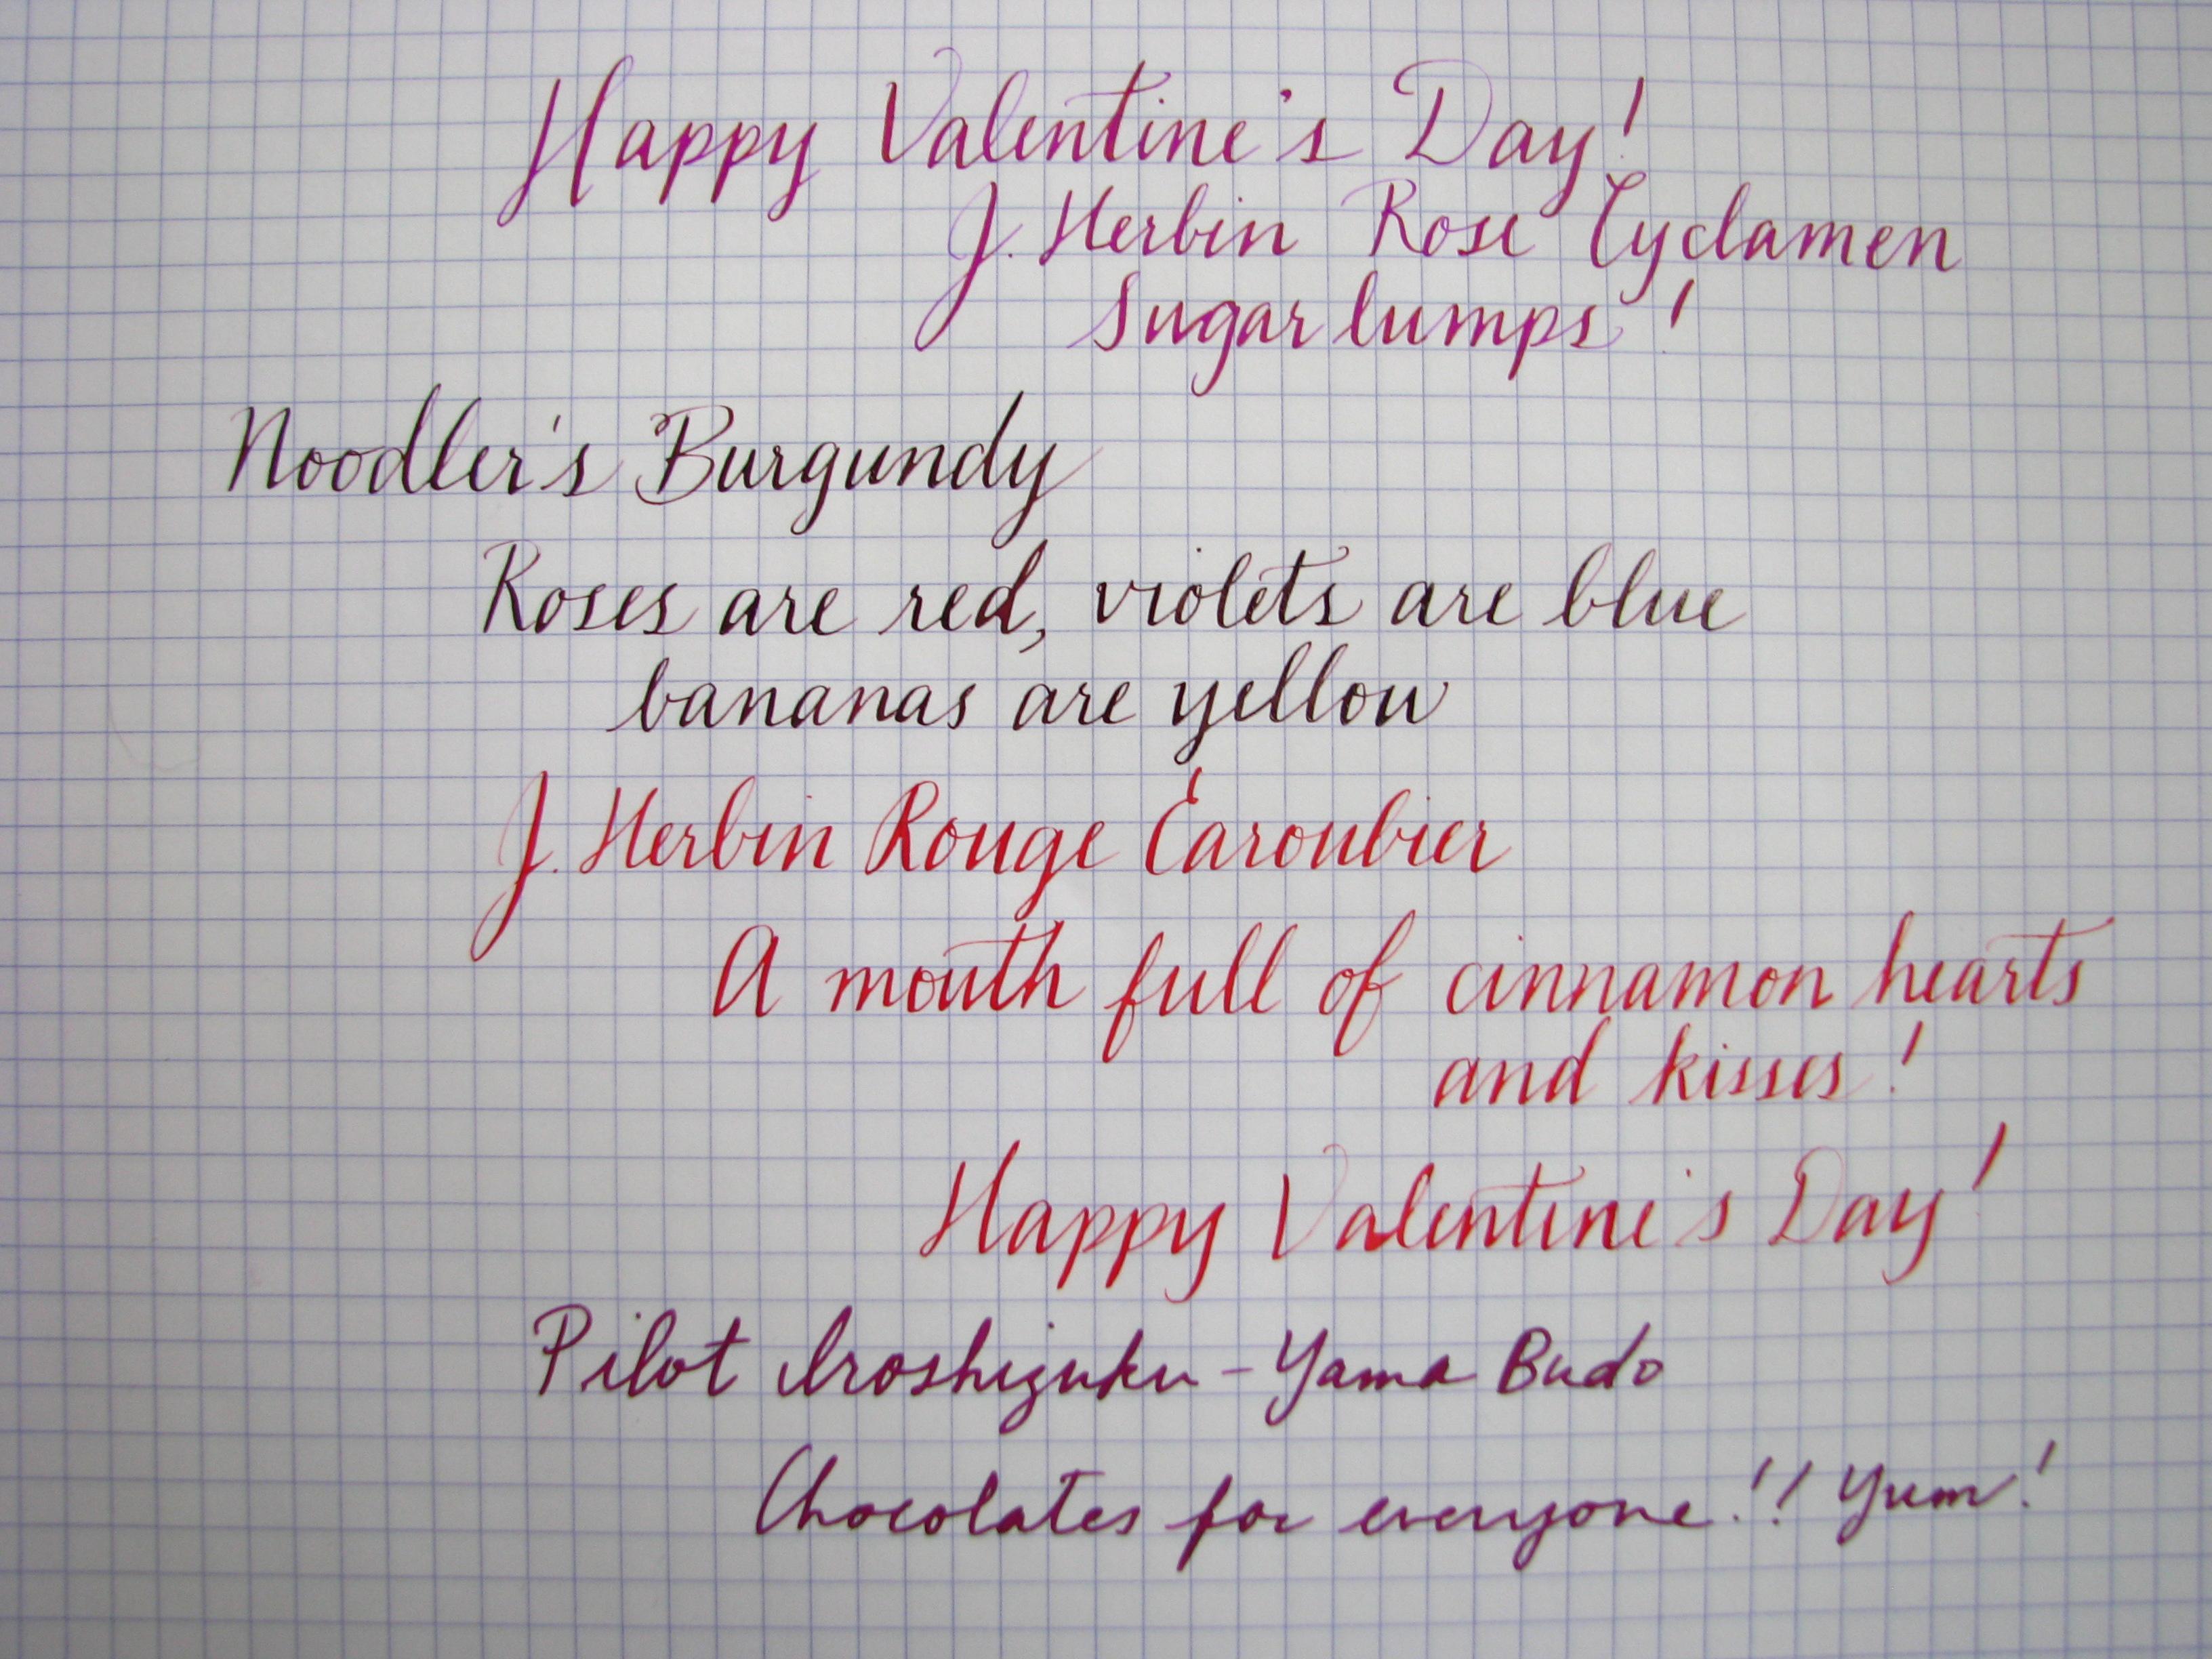 J. Herbin Rose Cyclamen, Noodler's Burgundy, J. Herbin Rouge Caroubier, Pilot Iroshizuku Yama-Budo Writing Samples at wonderpens.ca